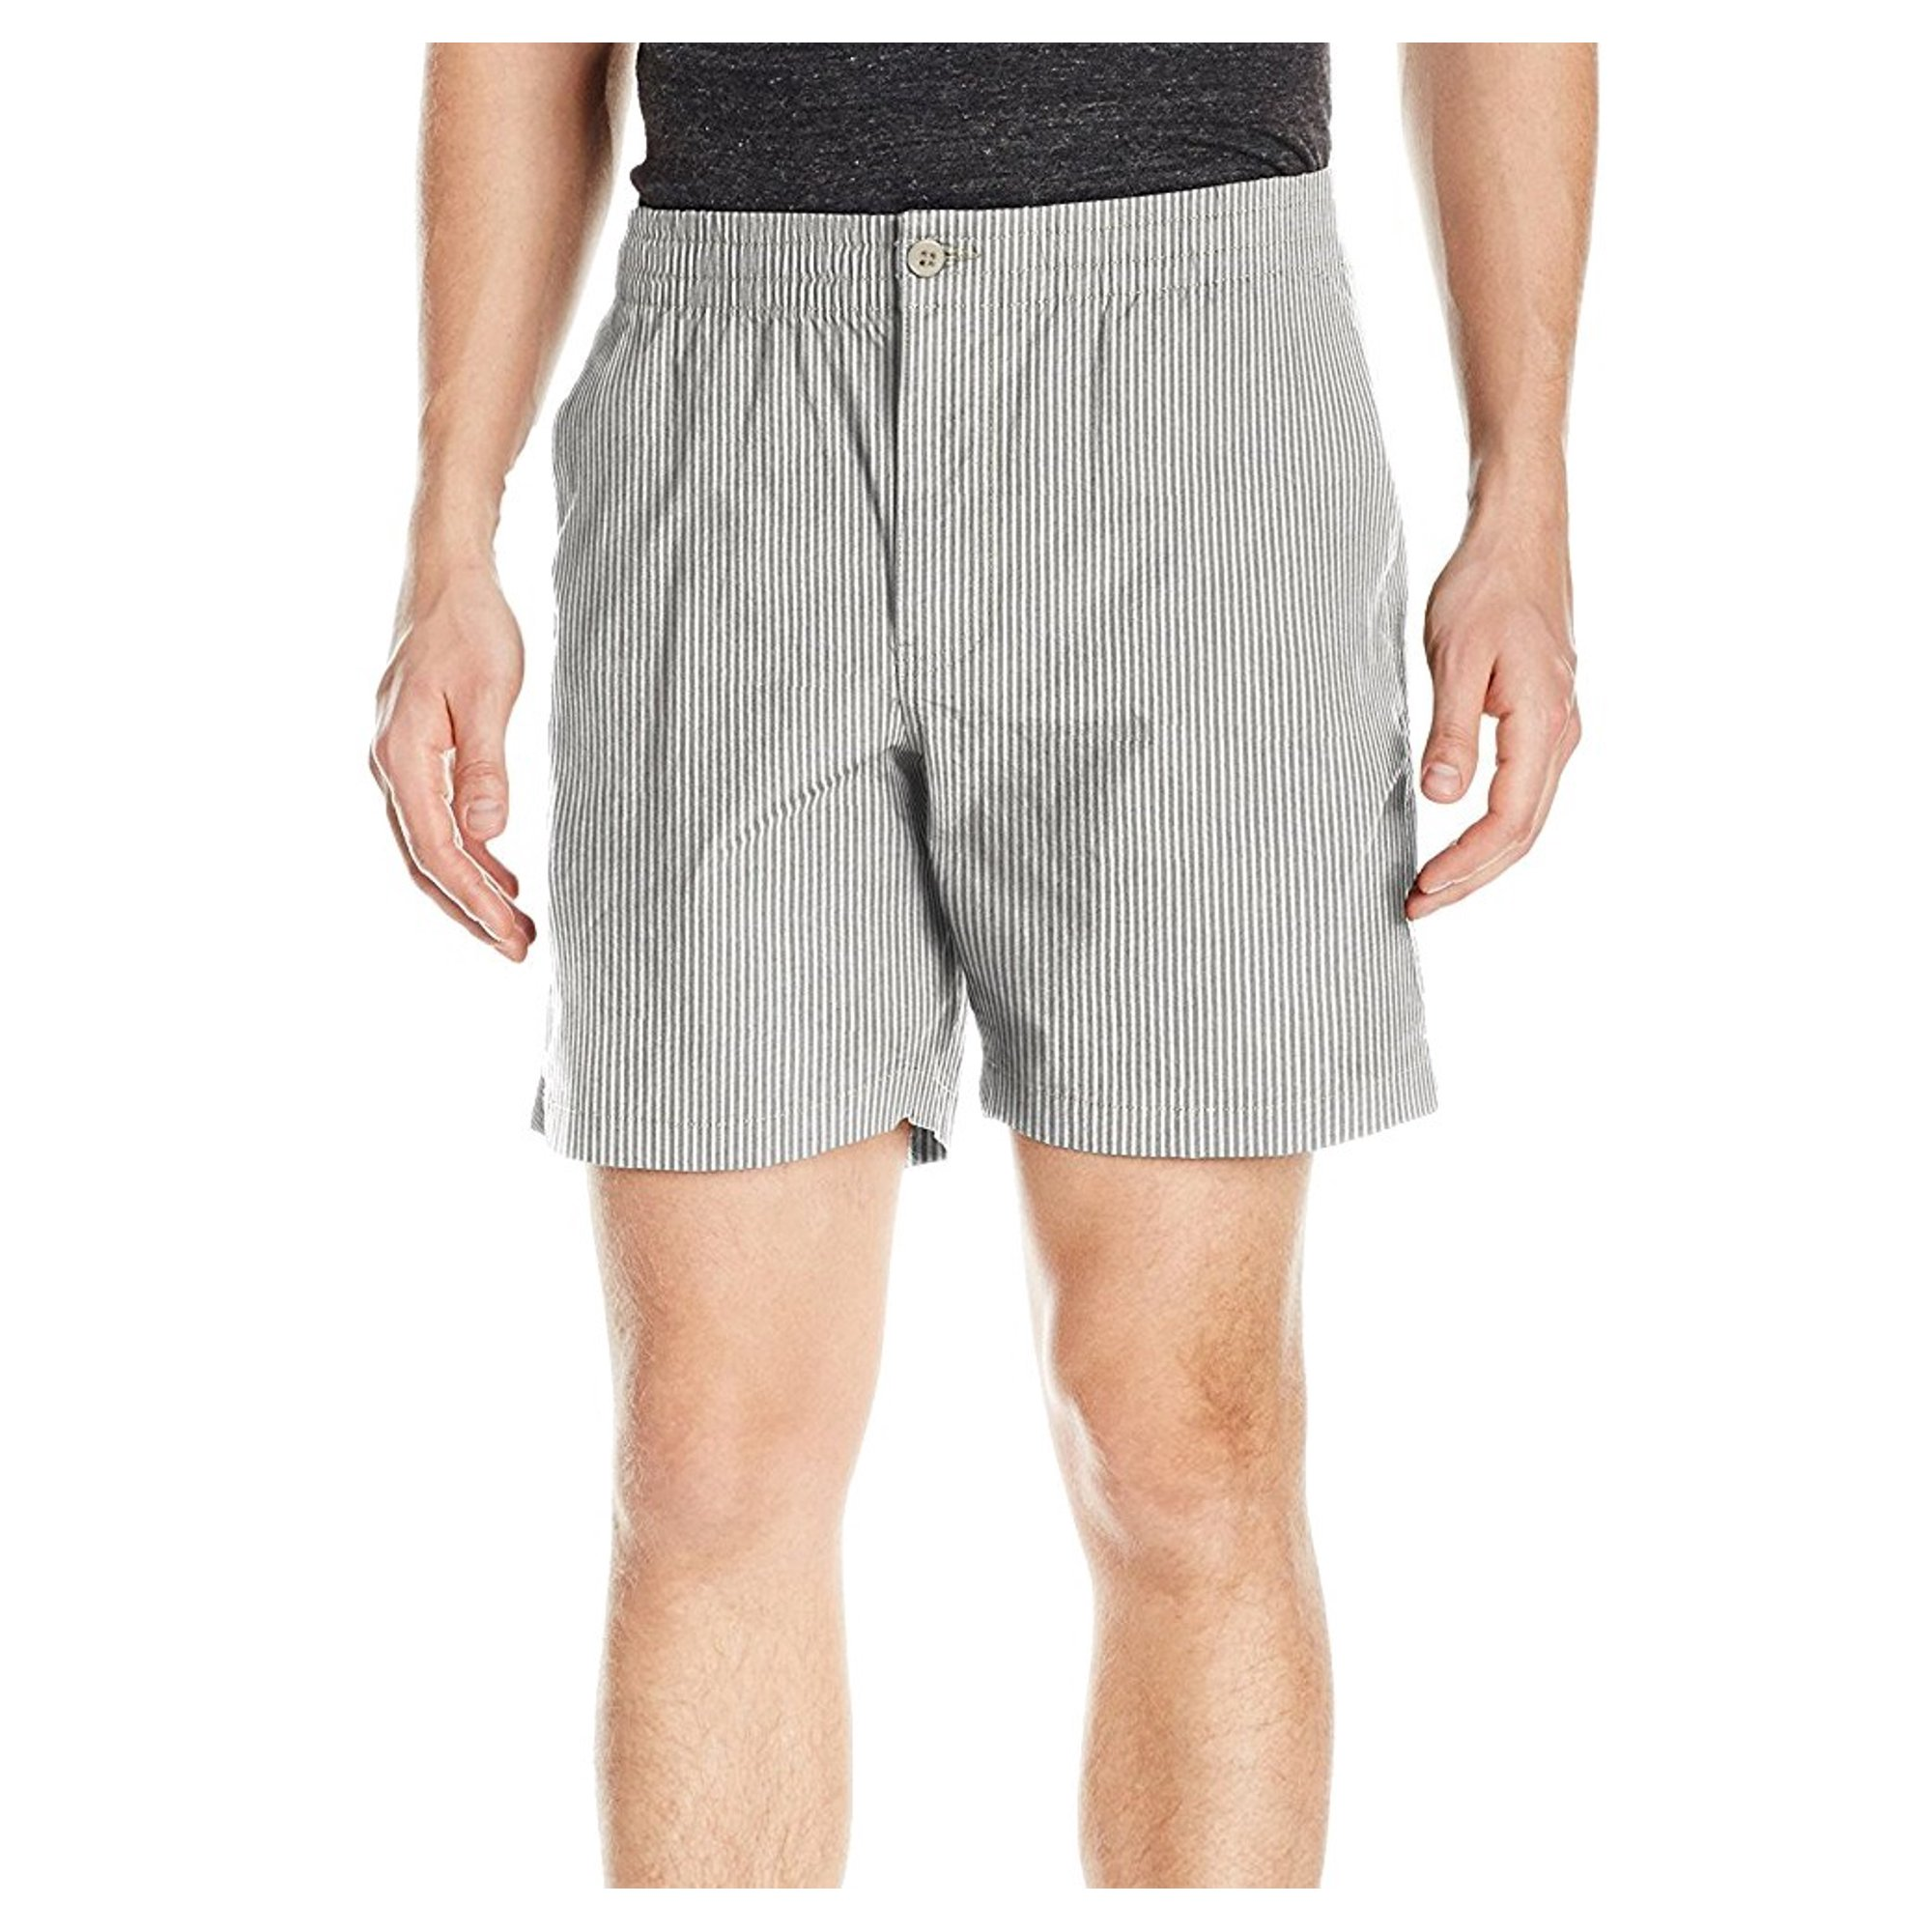 aefc3b1ffb Buy Dockers Mens Weekend Cruiser Casual Walking Shorts | Cheapest ...